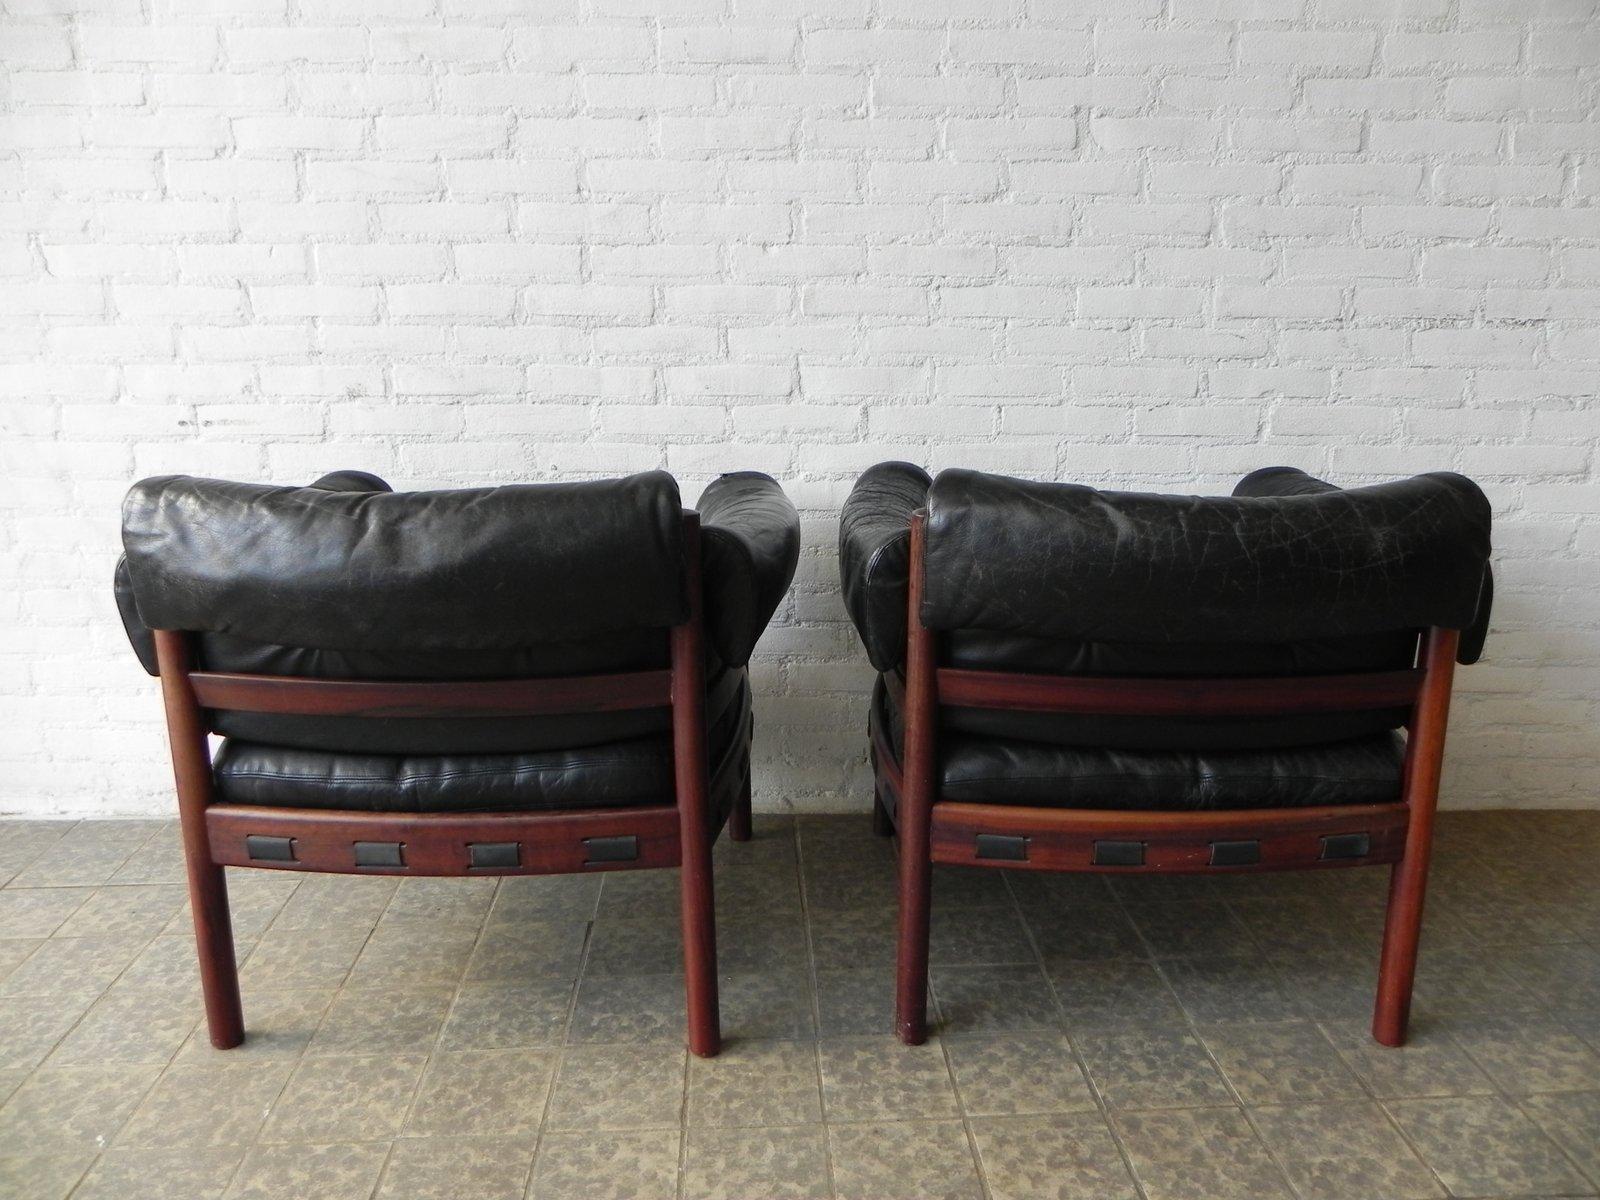 vintage ledersessel von arne norell f r coja 2er set bei pamono kaufen. Black Bedroom Furniture Sets. Home Design Ideas